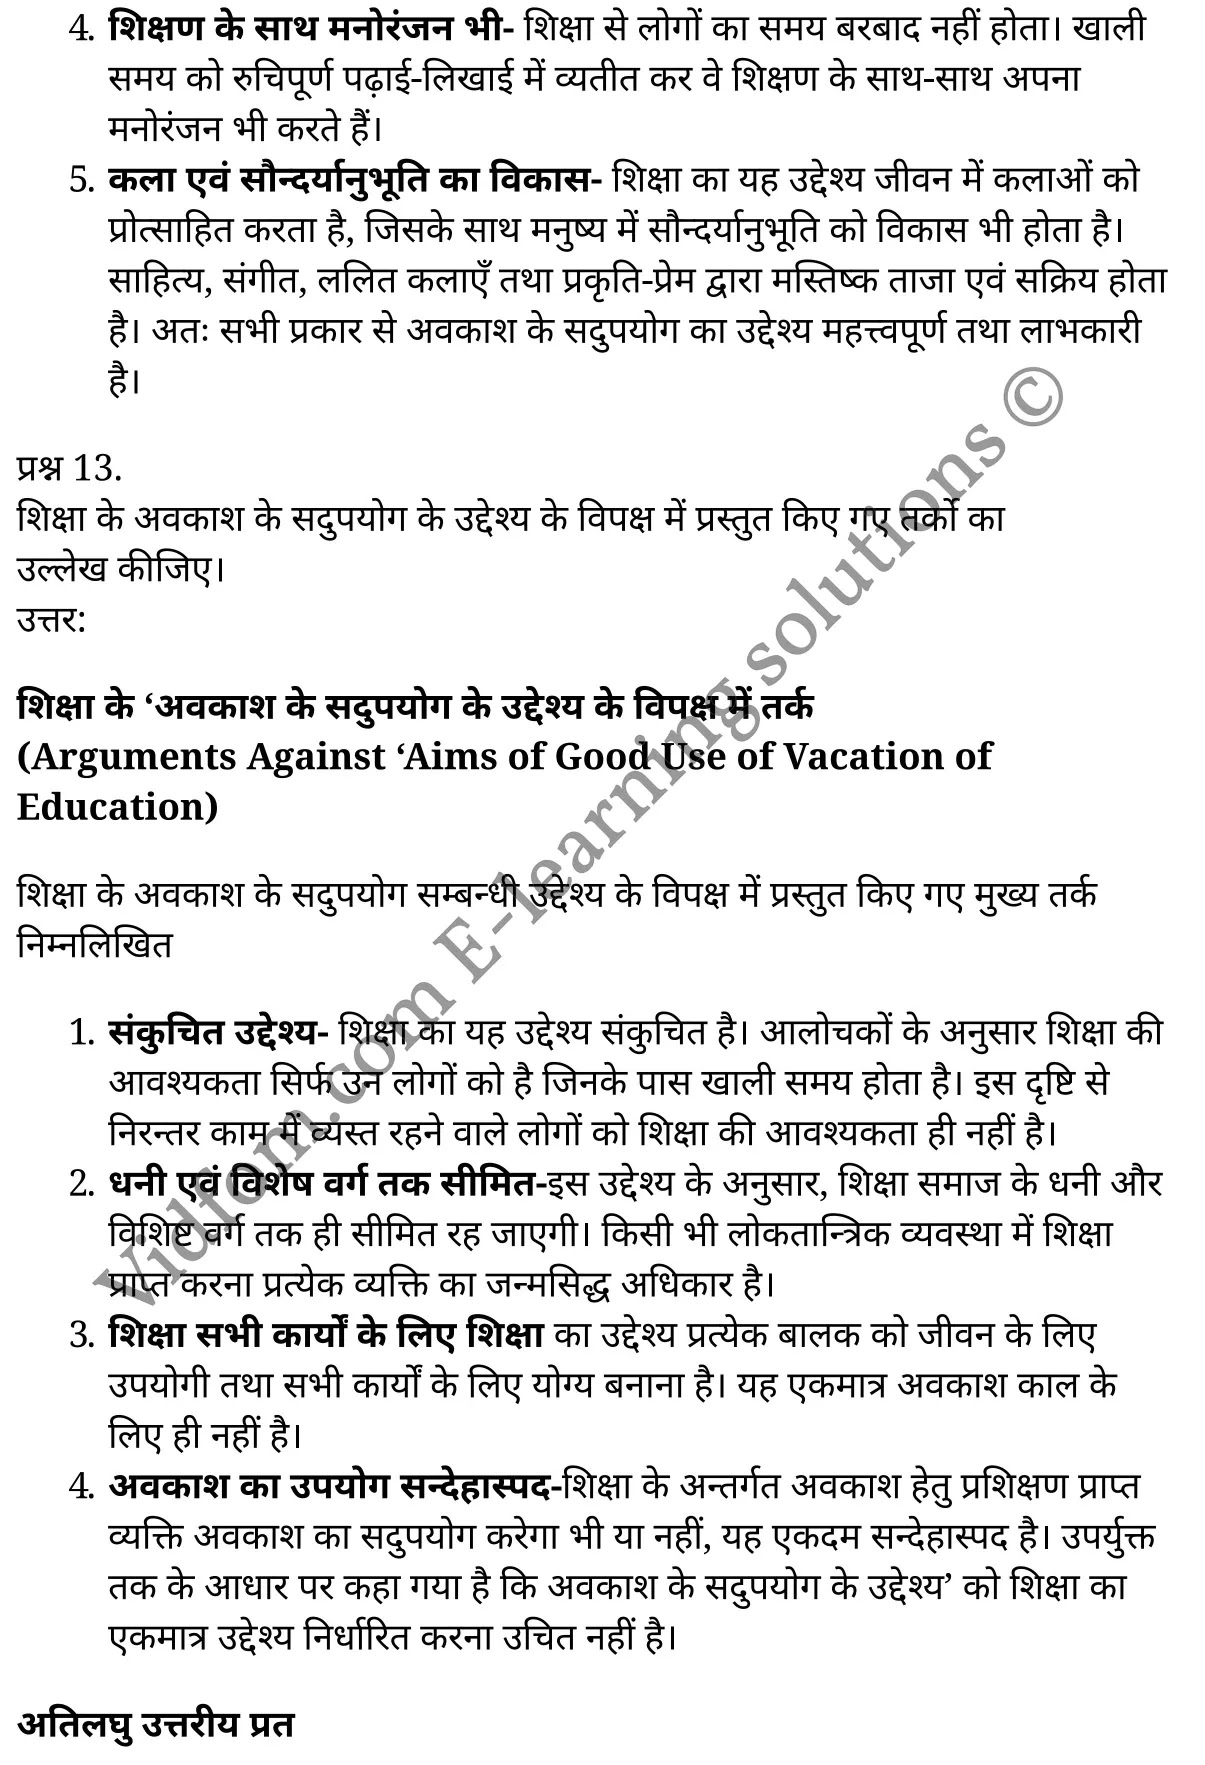 कक्षा 11 शिक्षाशास्त्र के नोट्स हिंदी में एनसीईआरटी समाधान, class 11 Pedagogy chapter 3, class 11 Pedagogy chapter 3 ncert solutions in Pedagogy, class 11 Pedagogy chapter 3 notes in hindi, class 11 Pedagogy chapter 3 question answer, class 11 Pedagogy chapter 3 notes, class 11 Pedagogy chapter 3 class 11 Pedagogy chapter 3 in hindi, class 11 Pedagogy chapter 3 important questions in hindi, class 11 Pedagogy hindi chapter 3 notes in hindi, class 11 Pedagogy chapter 3 test, class 11 Pedagogy chapter 3 class 11 Pedagogy chapter 3 pdf, class 11 Pedagogy chapter 3 notes pdf, class 11 Pedagogy chapter 3 exercise solutions, class 11 Pedagogy chapter 3, class 11 Pedagogy chapter 3 notes study rankers, class 11 Pedagogy chapter 3 notes, class 11 Pedagogy hindi chapter 3 notes, class 11 Pedagogy chapter 3 class 11 notes pdf, class 11 Pedagogy chapter 3 class 11 notes ncert, class 11 Pedagogy chapter 3 class 11 pdf, class 11 Pedagogy chapter 3 book, class 11 Pedagogy chapter 3 quiz class 11 , 11 th class 11 Pedagogy chapter 3 book up board, up board 11 th class 11 Pedagogy chapter 3 notes, class 11 Pedagogy, class 11 Pedagogy ncert solutions in Pedagogy, class 11 Pedagogy notes in hindi, class 11 Pedagogy question answer, class 11 Pedagogy notes, class 11 Pedagogy class 11 Pedagogy chapter 3 in hindi, class 11 Pedagogy important questions in hindi, class 11 Pedagogy notes in hindi, class 11 Pedagogy test, class 11 Pedagogy class 11 Pedagogy chapter 3 pdf, class 11 Pedagogy notes pdf, class 11 Pedagogy exercise solutions, class 11 Pedagogy, class 11 Pedagogy notes study rankers, class 11 Pedagogy notes, class 11 Pedagogy notes, class 11 Pedagogy class 11 notes pdf, class 11 Pedagogy class 11 notes ncert, class 11 Pedagogy class 11 pdf, class 11 Pedagogy book, class 11 Pedagogy quiz class 11 , 11 th class 11 Pedagogy book up board, up board 11 th class 11 Pedagogy notes, कक्षा 11 शिक्षाशास्त्र अध्याय 3 , कक्षा 11 शिक्षाशास्त्र, कक्षा 11 शिक्षाशास्त्र अध्याय 3 के नोट्स हिंदी में